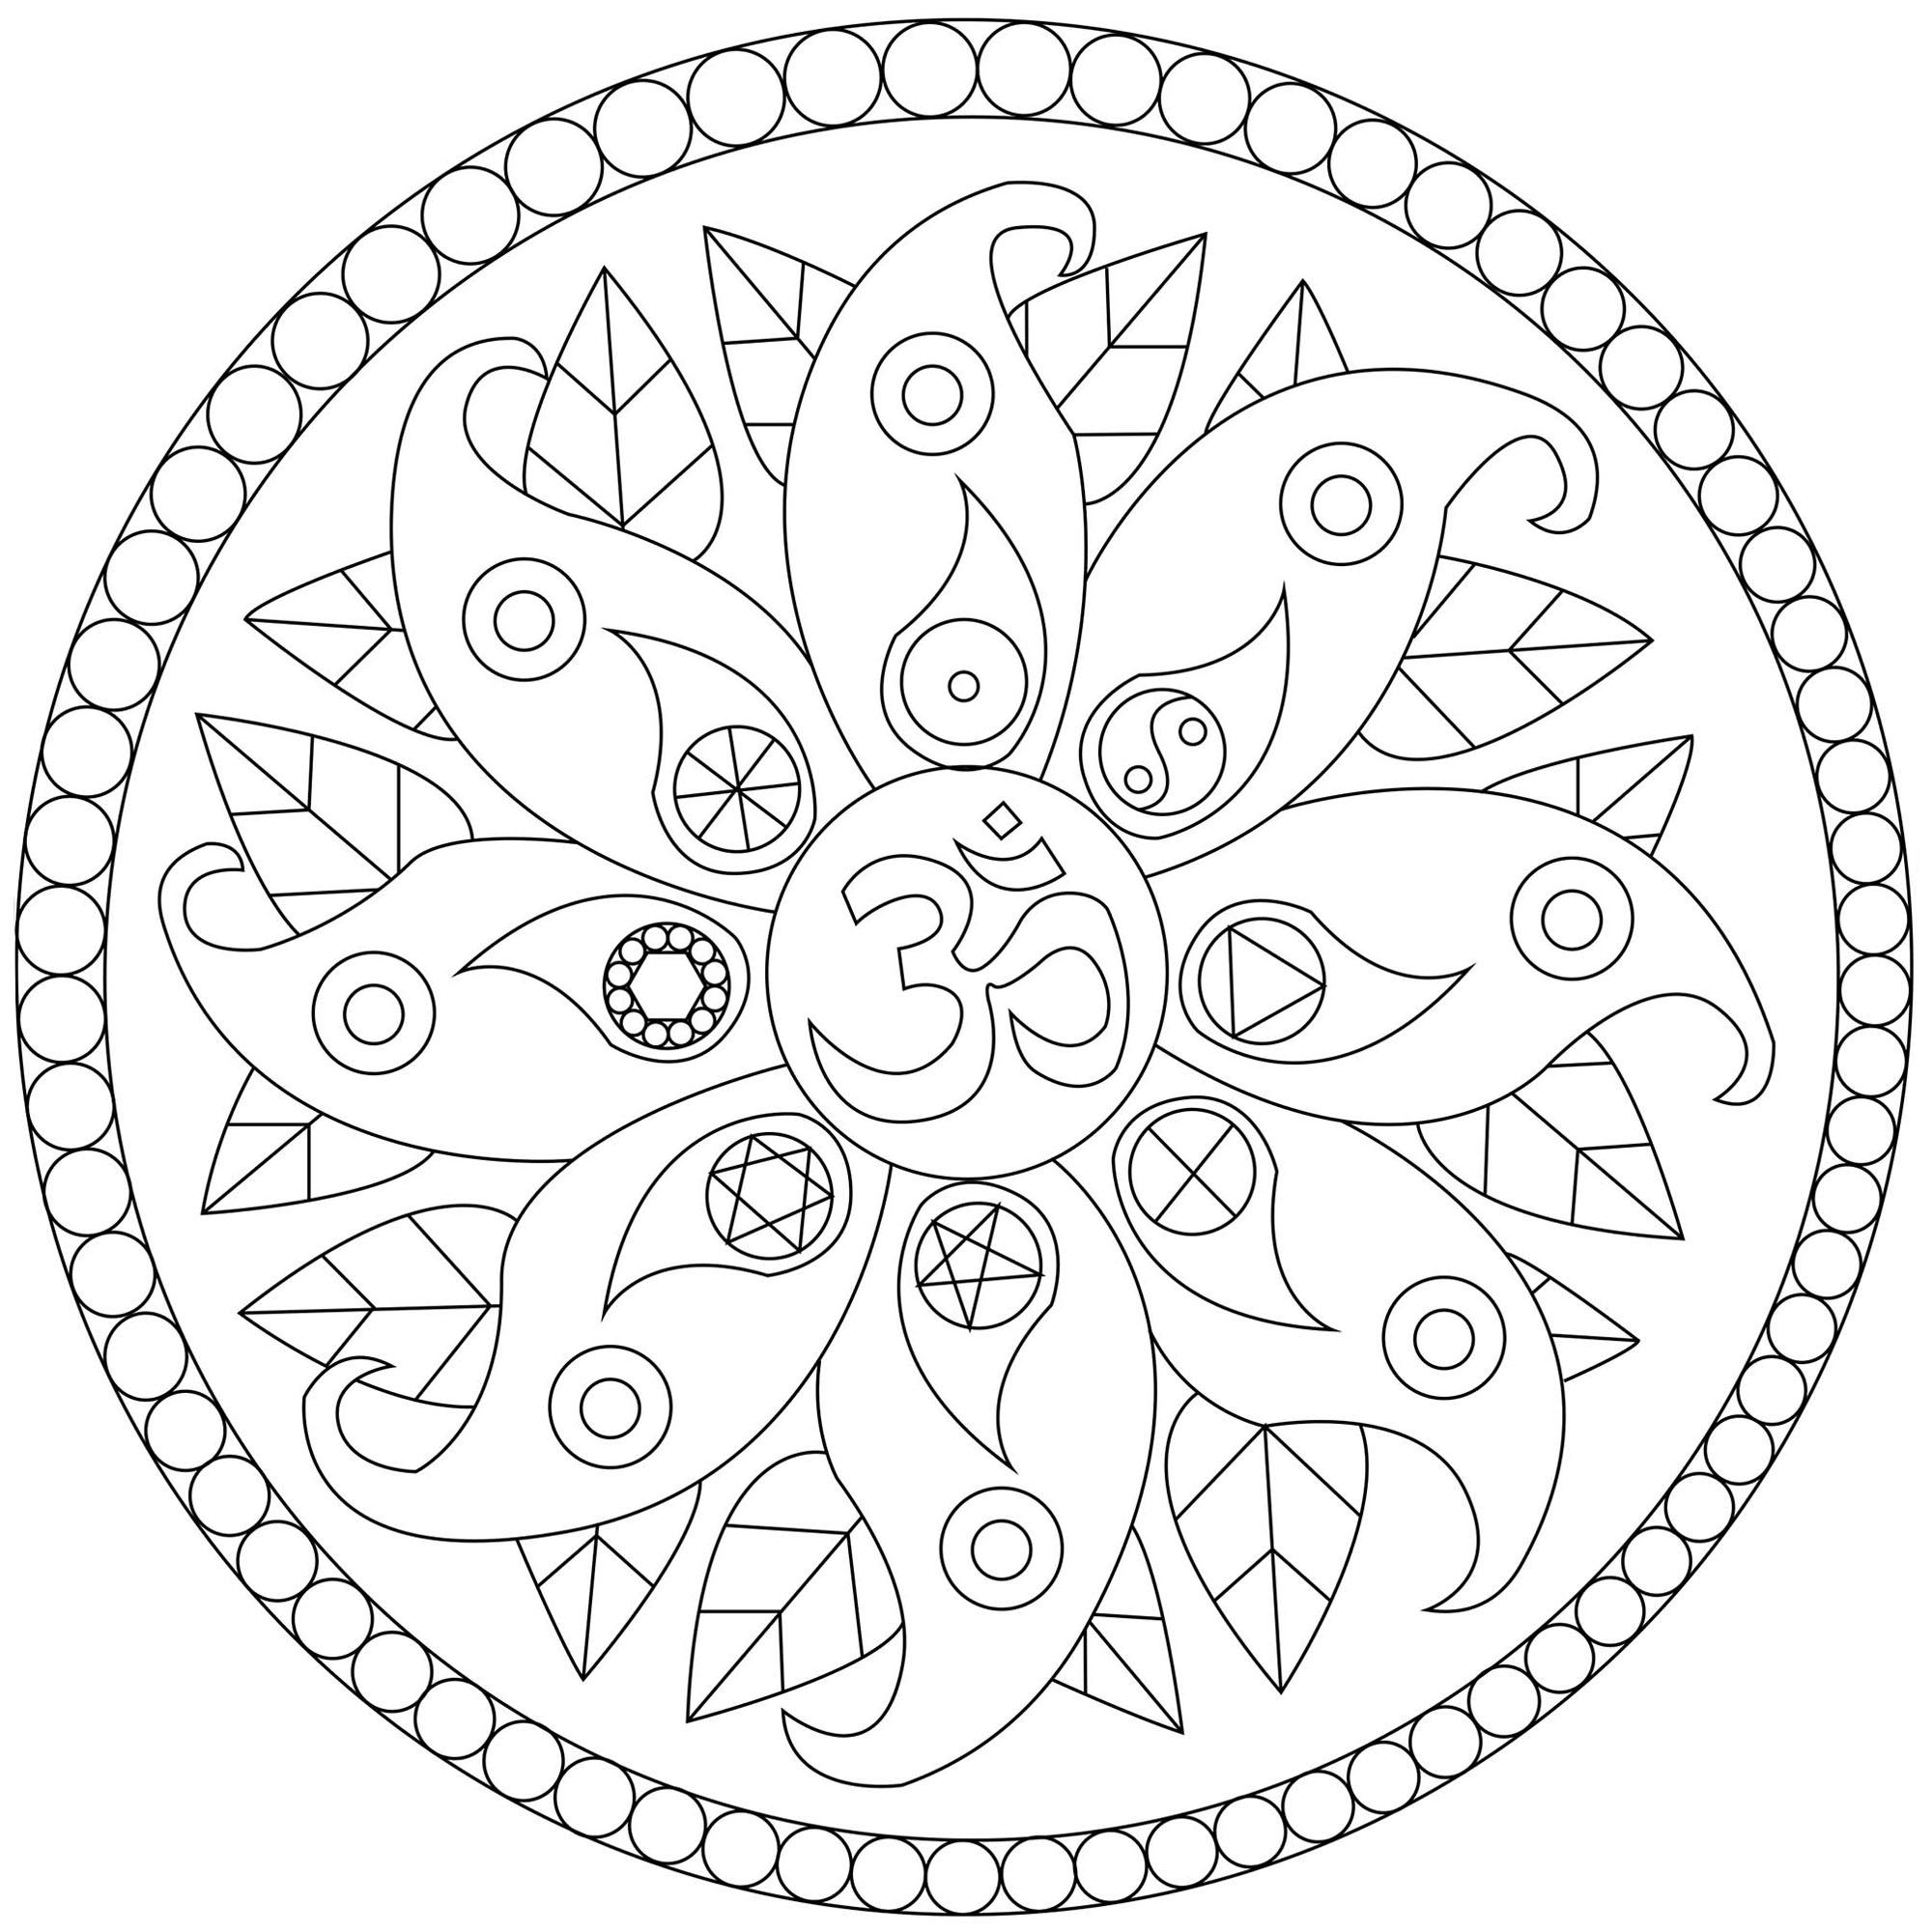 Mandala With Peace Symbols